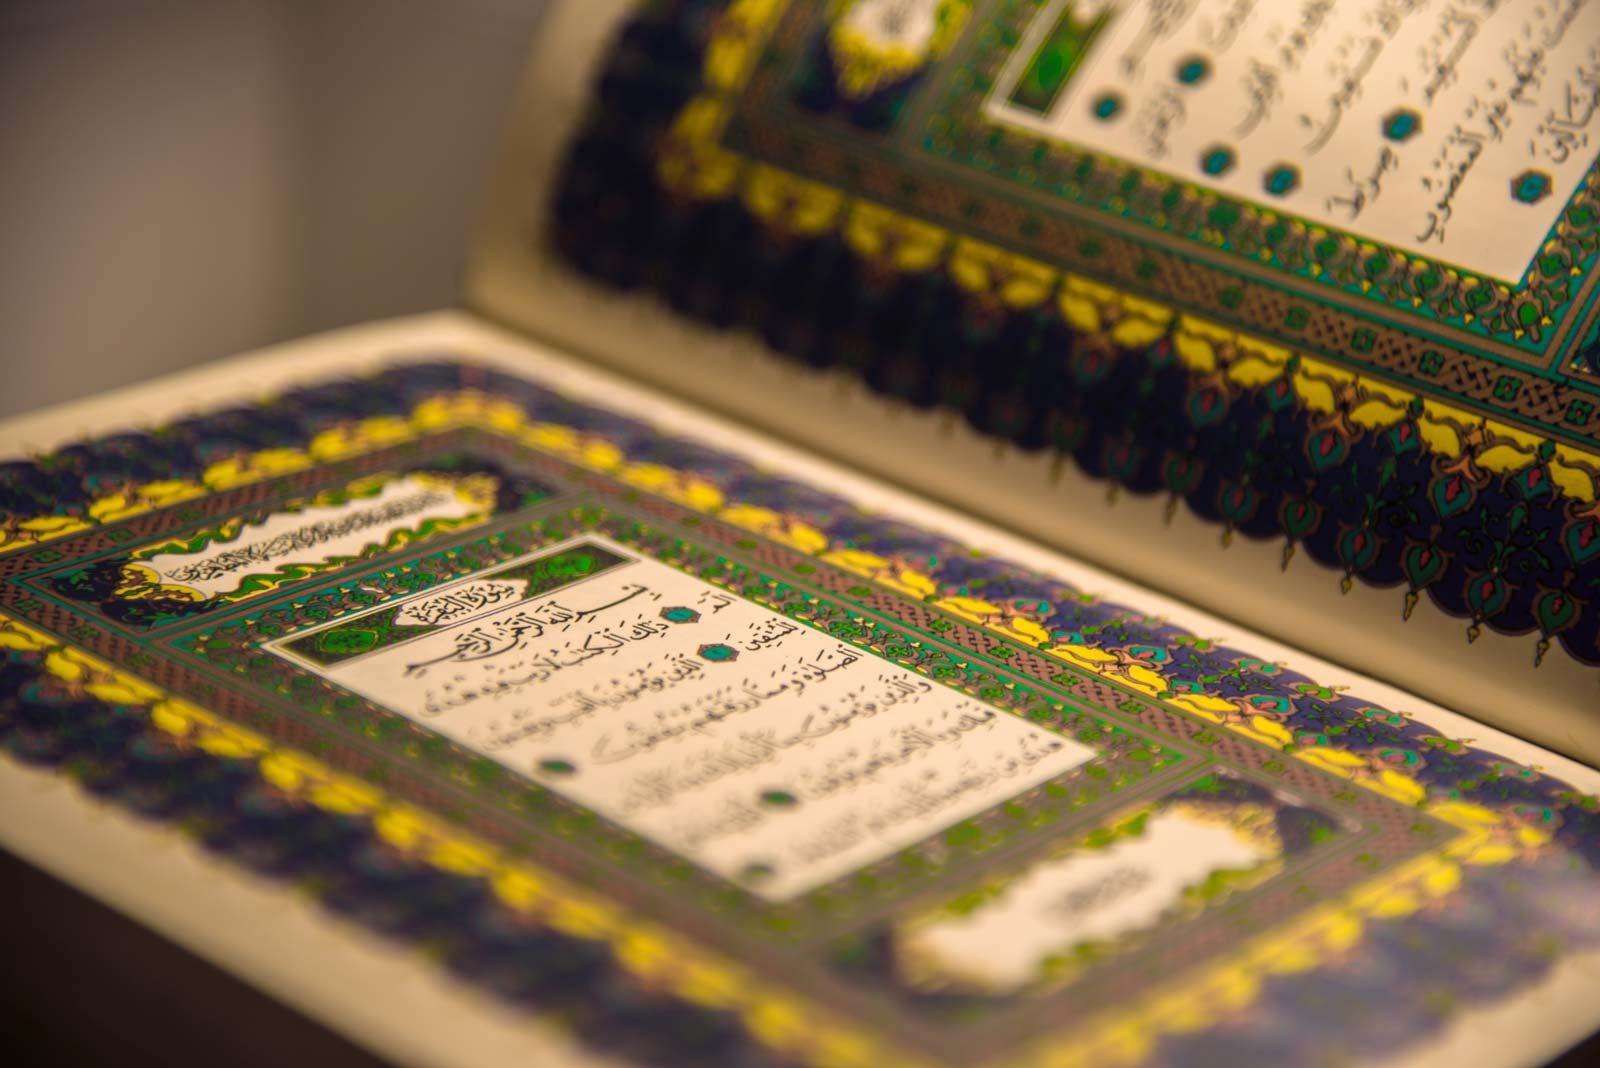 Ramadan Mubarak Fresh Ramadan Content Every Day Special Page About Islam Quran Ramadan Night Prayer